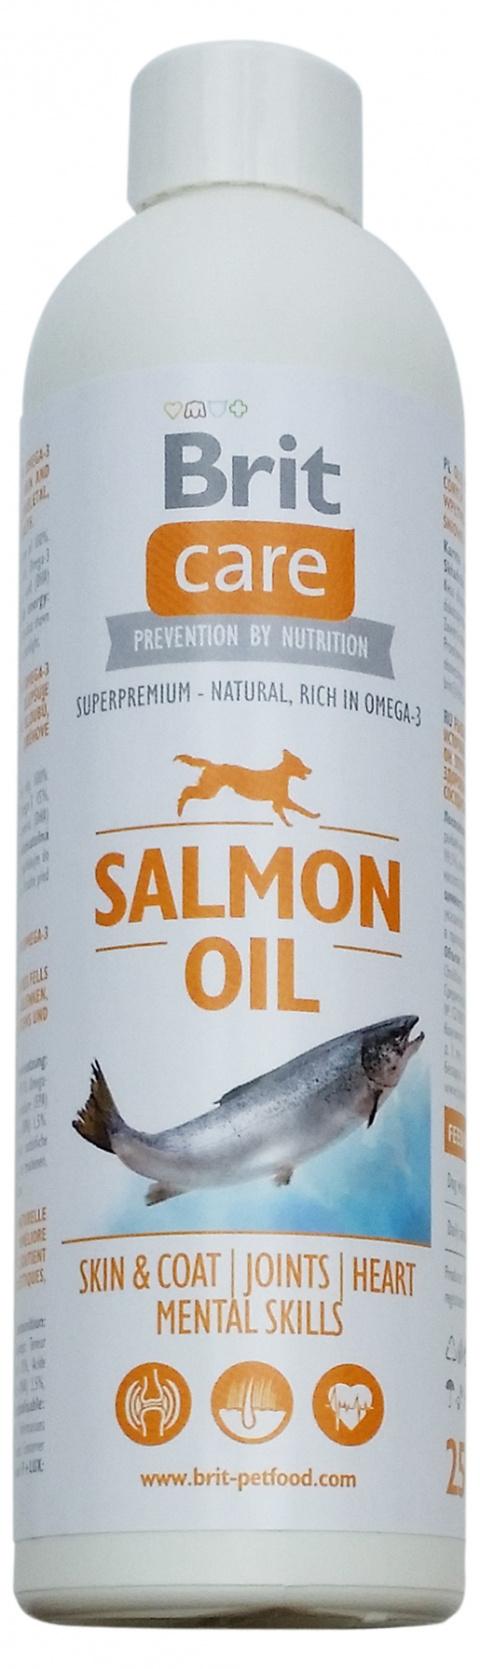 Lososový olej BRIT Care Salmon Oil 250ml title=